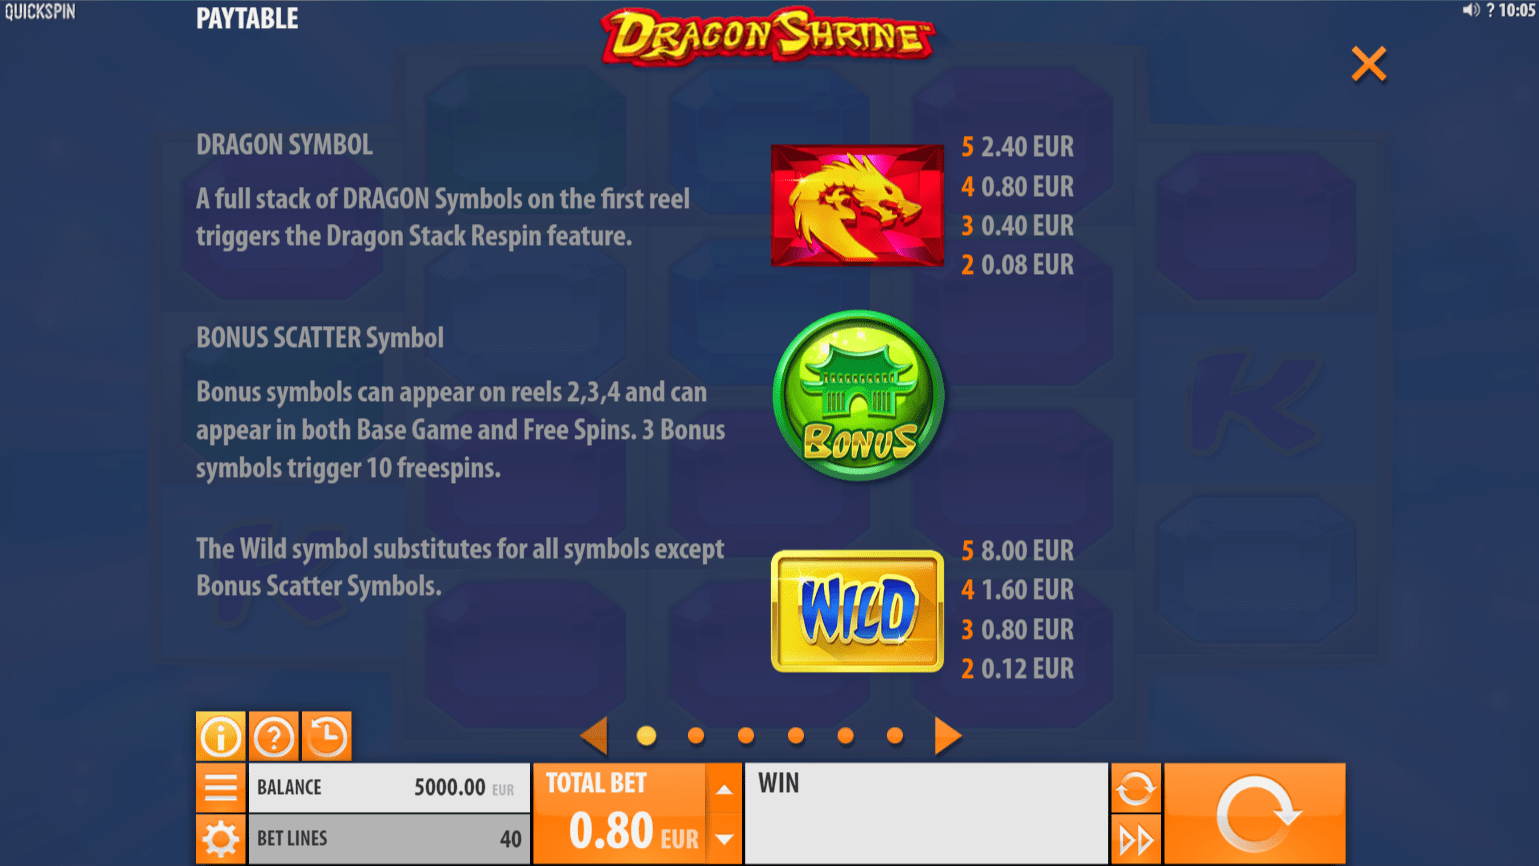 Dragon Shrine Slot Game Symbols and Winning Combinations